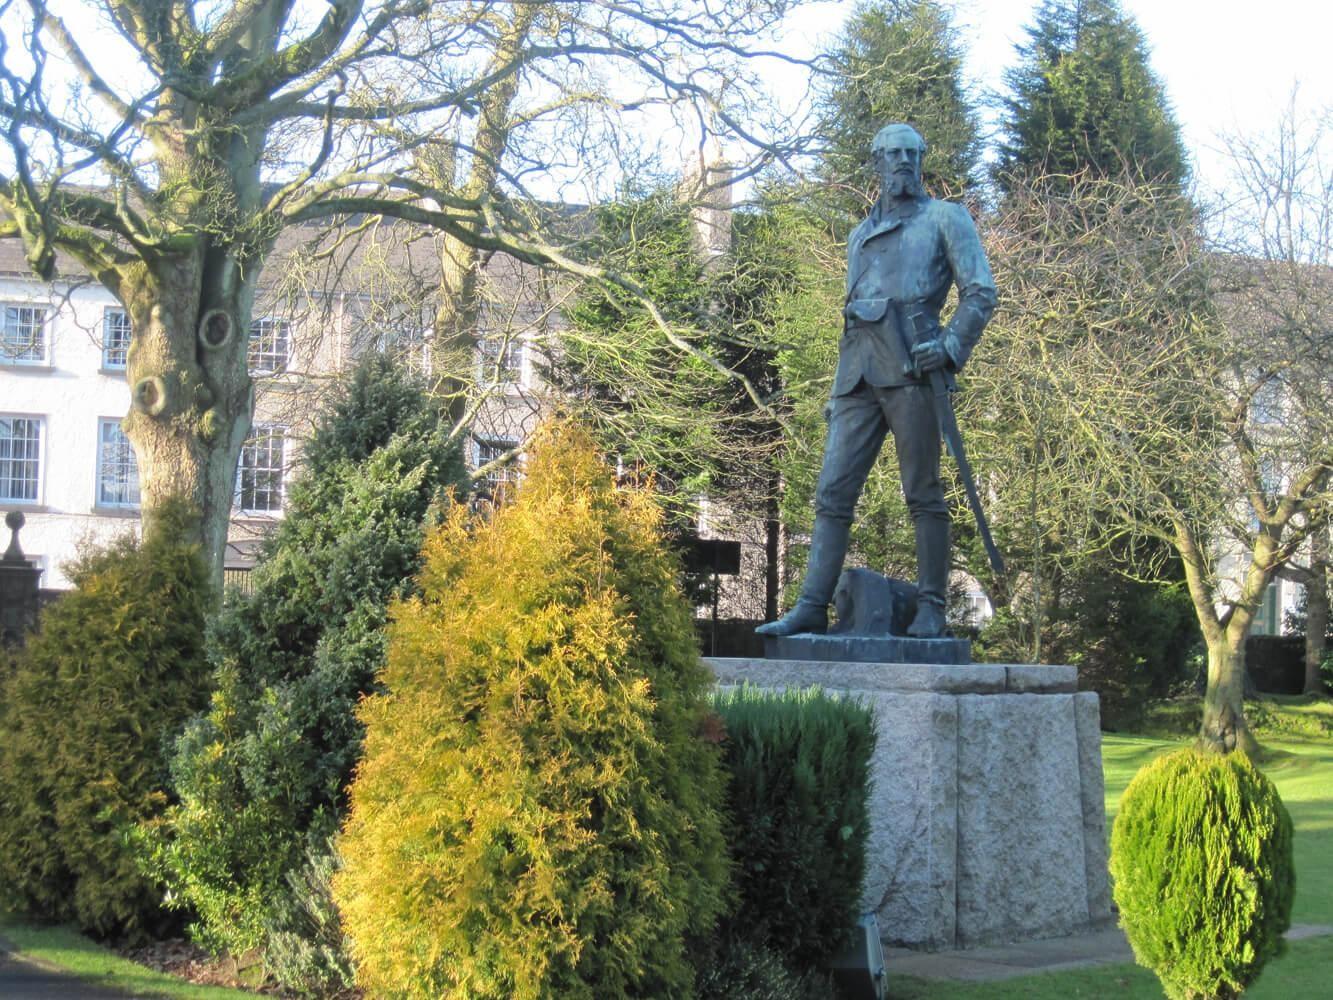 Brigadier John Nicholson statue at the Royal School Dungannon (RSD)